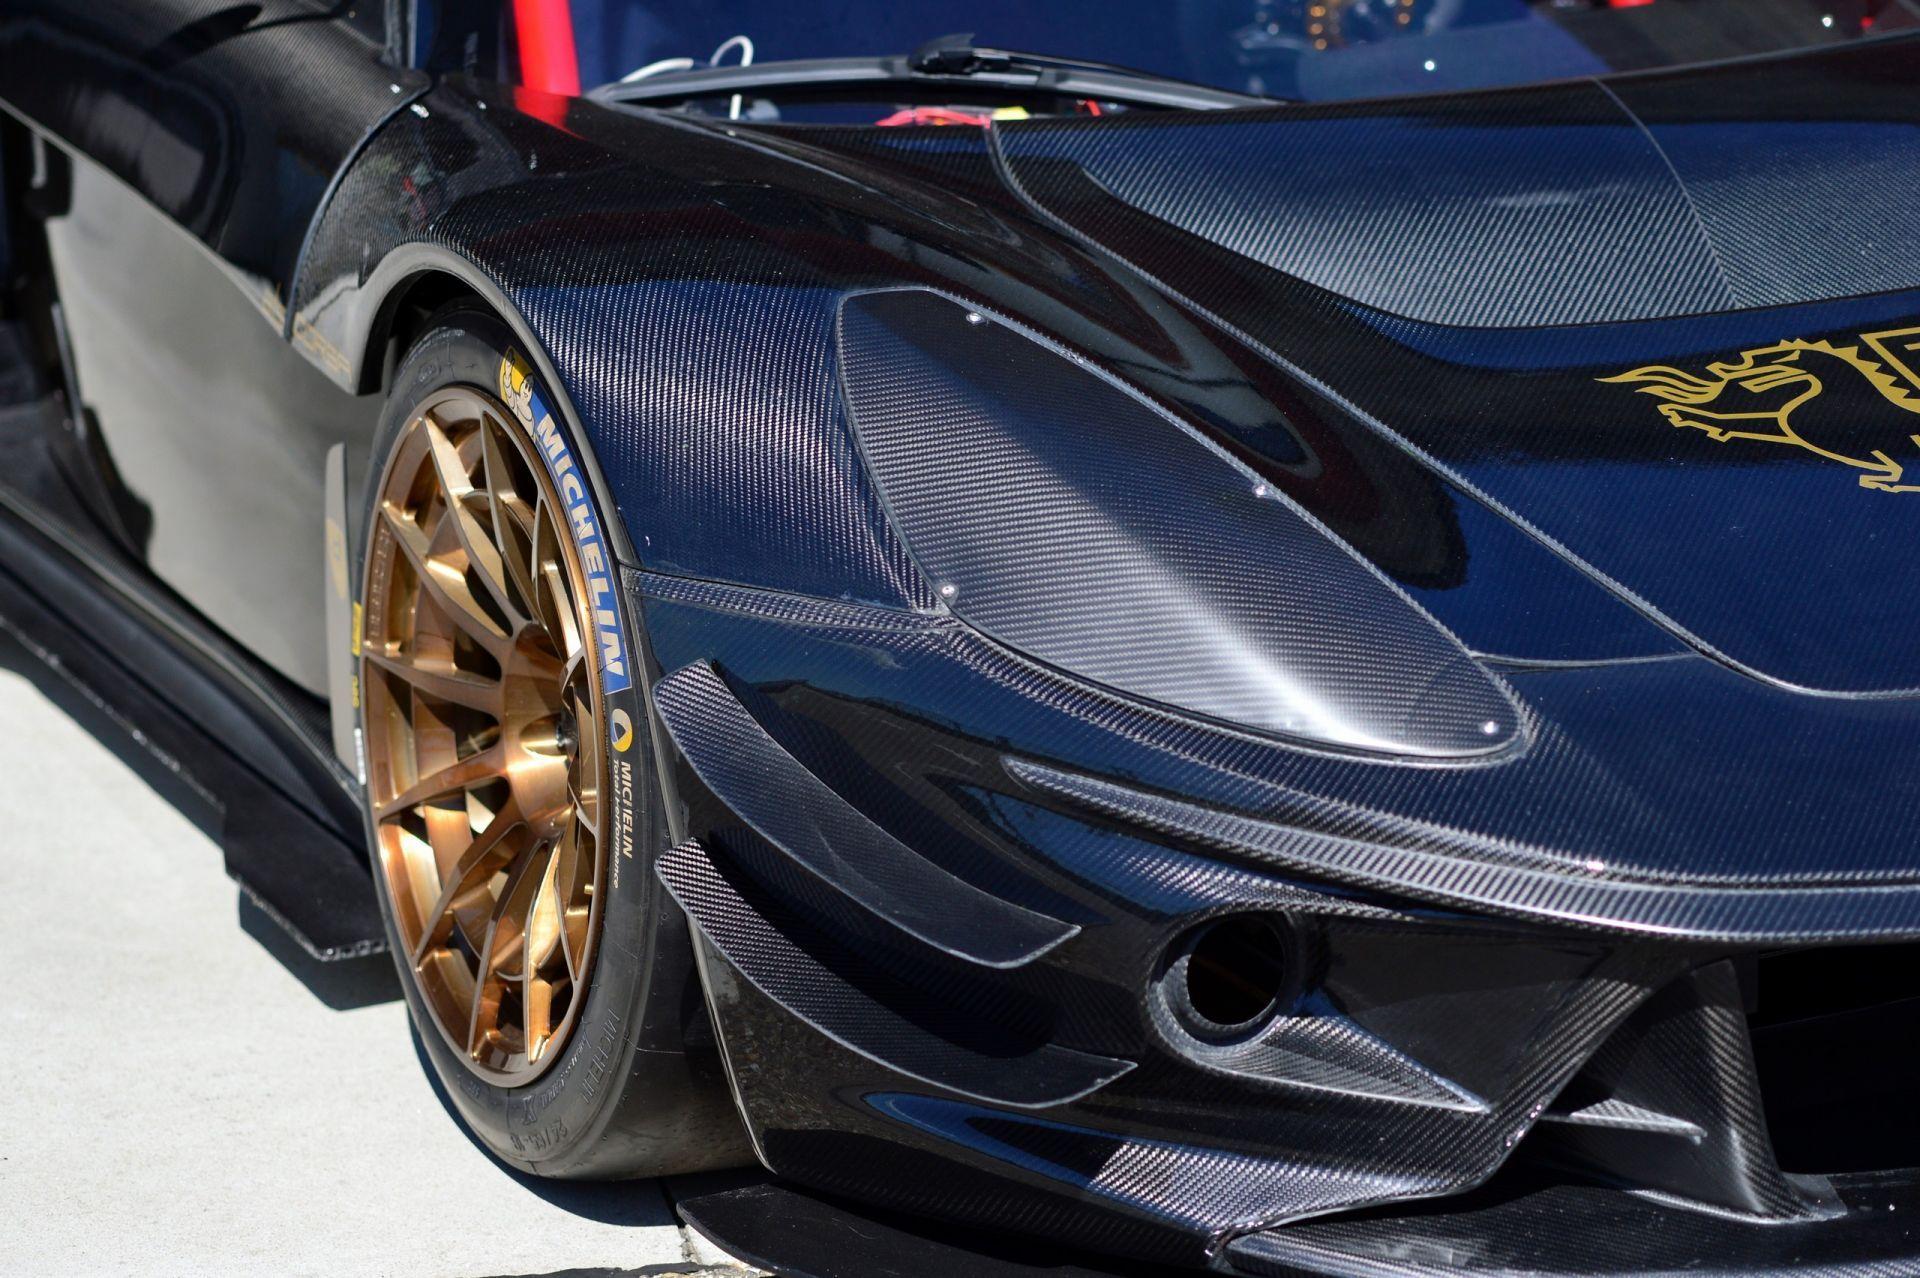 ATS-Corsa-RR-Turbo-Serie-Carbonio-18